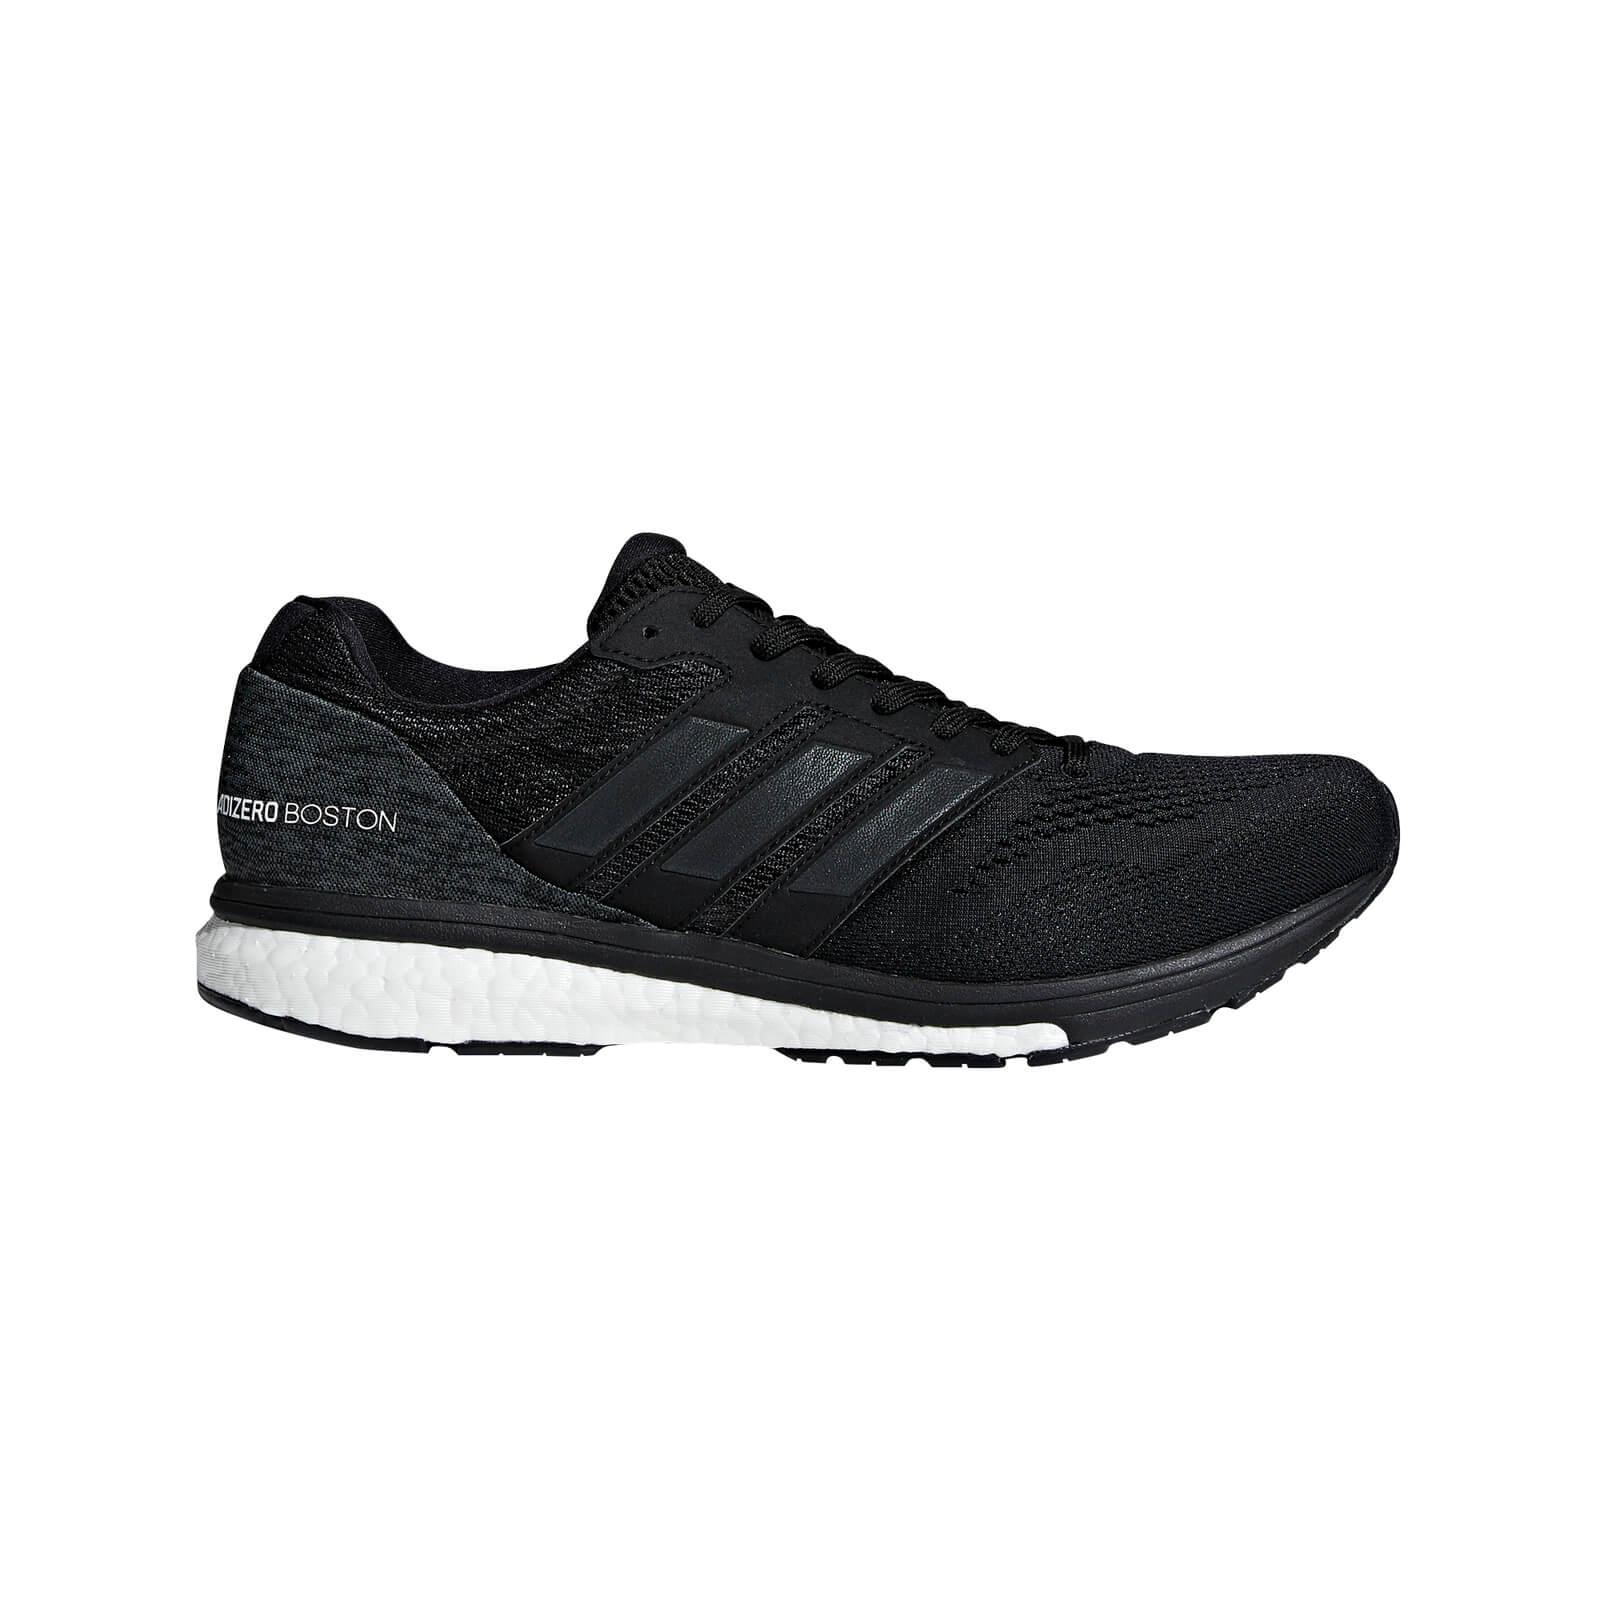 online retailer 3e3c3 f17bd adidas Men s Adizero Boston 7 Running Shoes - Black   ProBikeKit.com